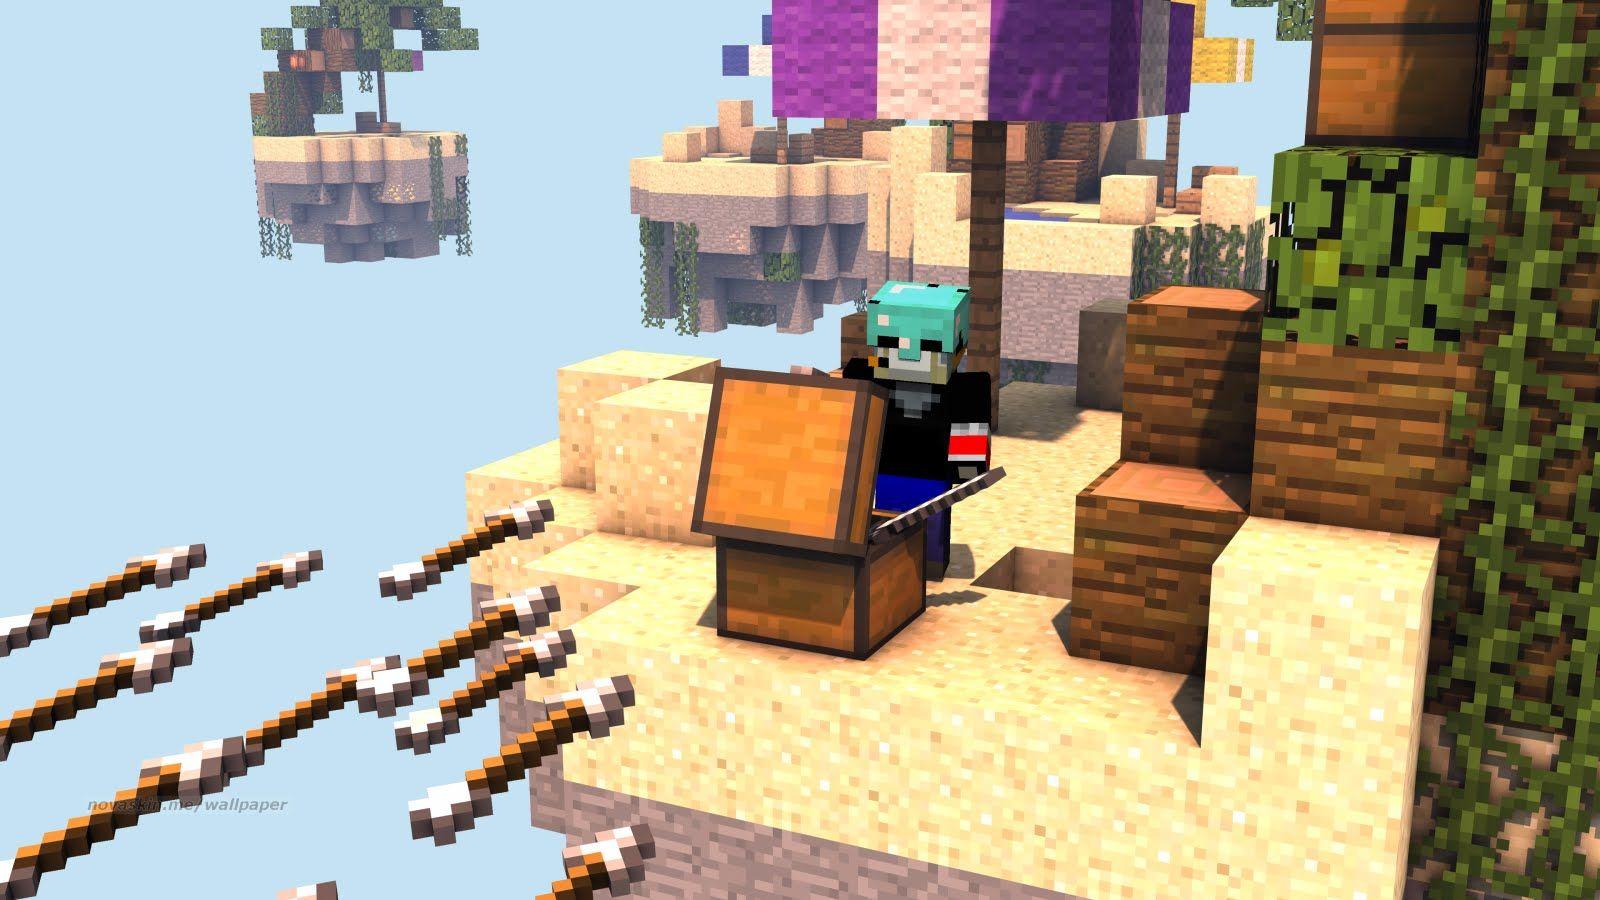 Minecraft Skywars Going Clutch For Real Howling Games Pinterest - Minecraft skywars spiele